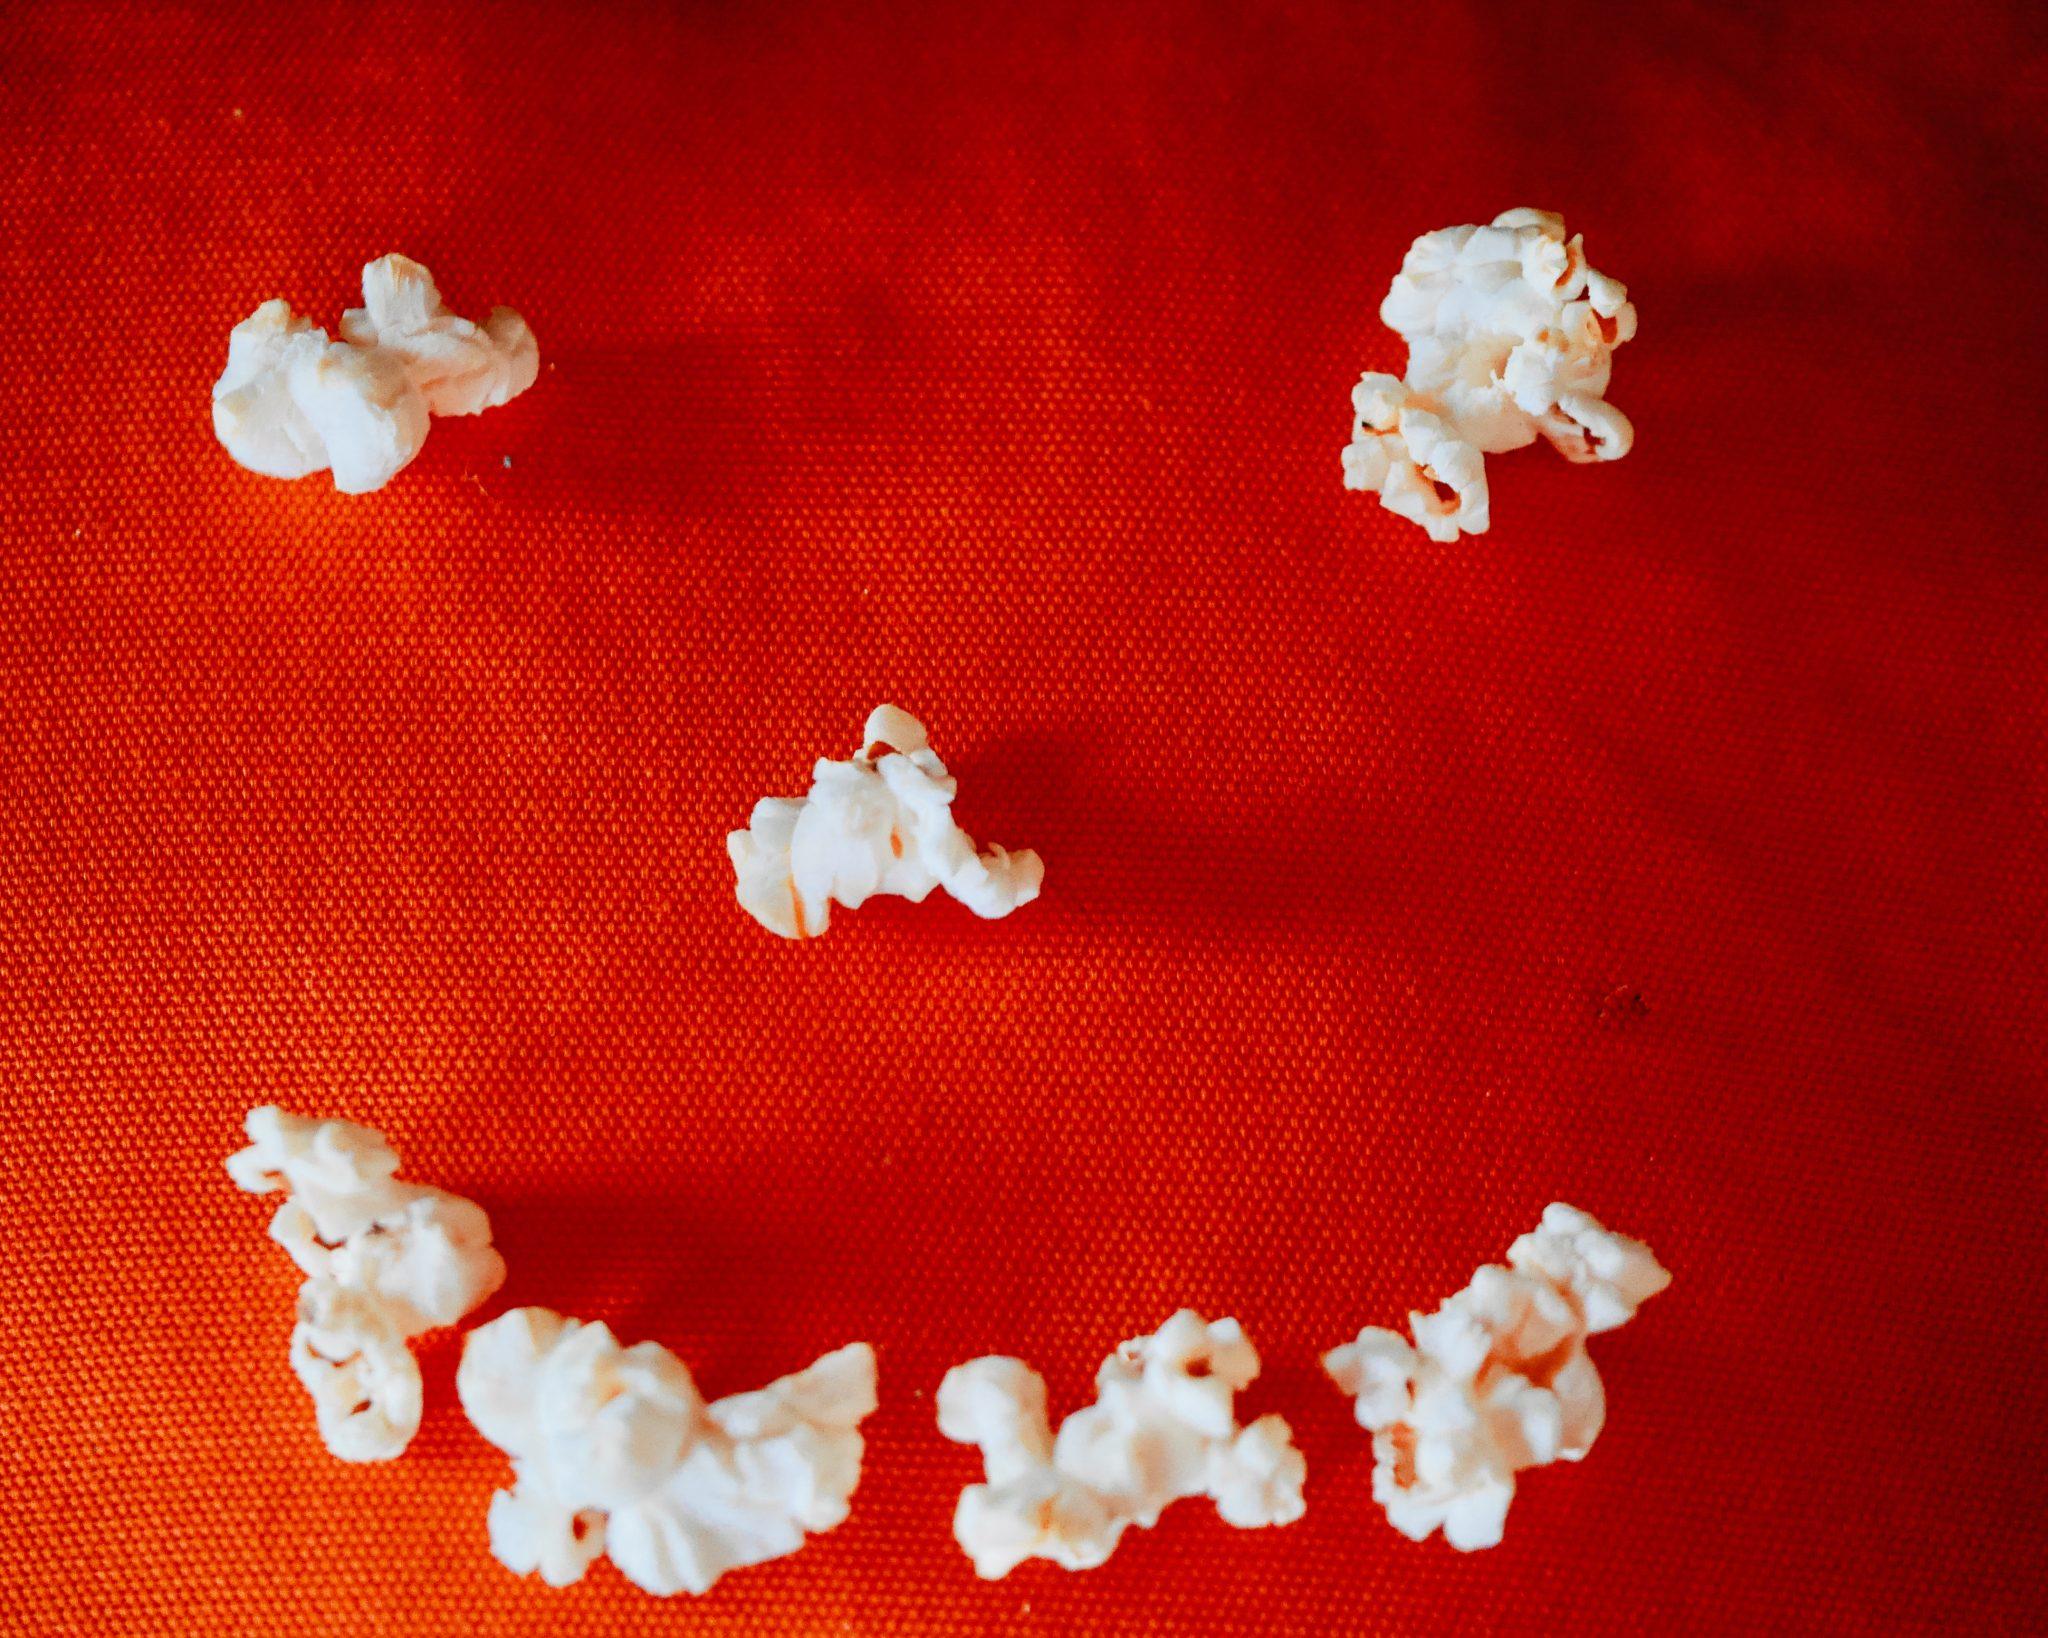 7 bits of popcorn